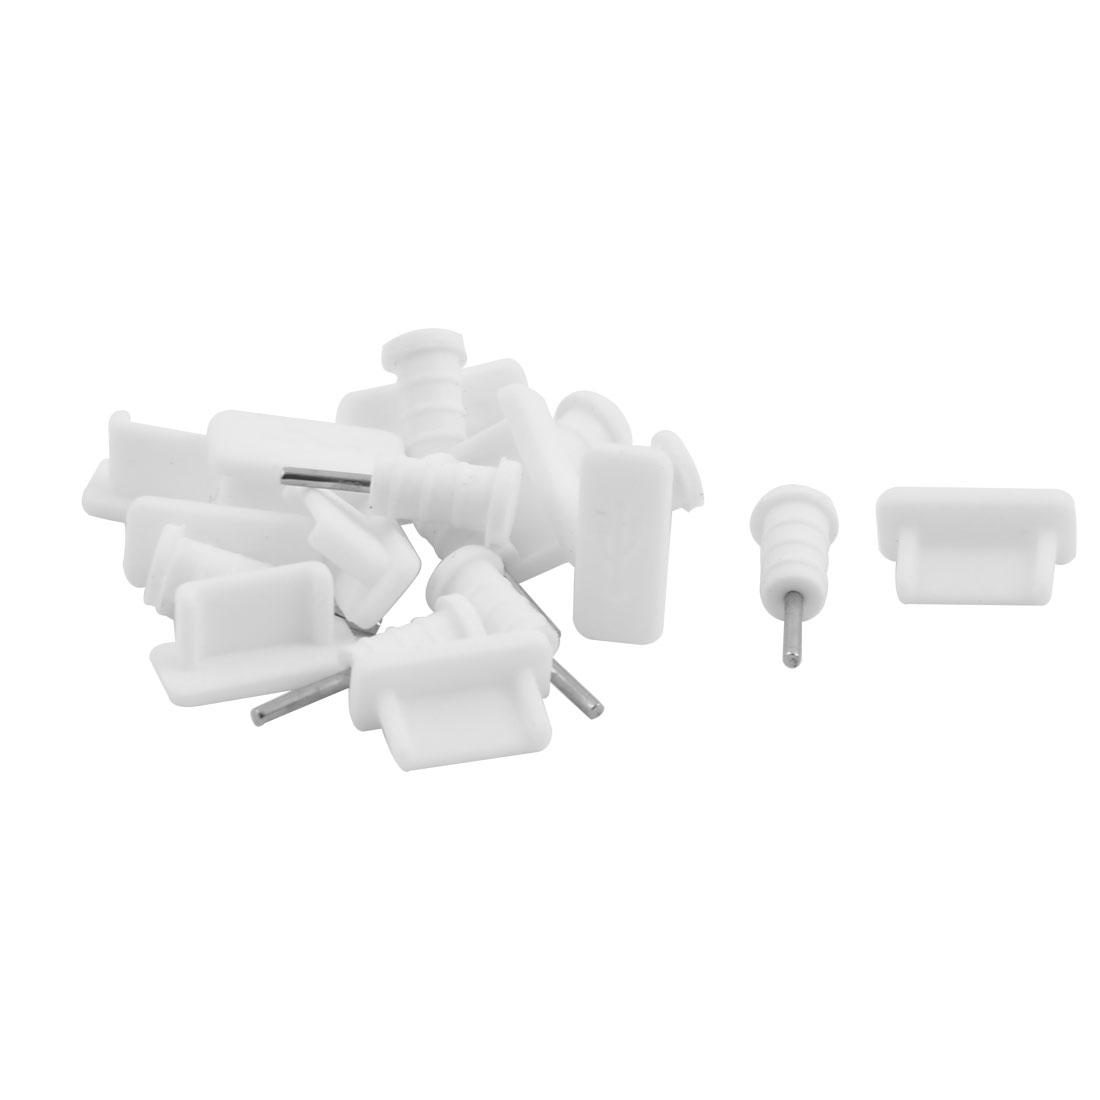 Silicone Earphone Dock Port Anti Dust Cap White 10 Set for Type C Phone